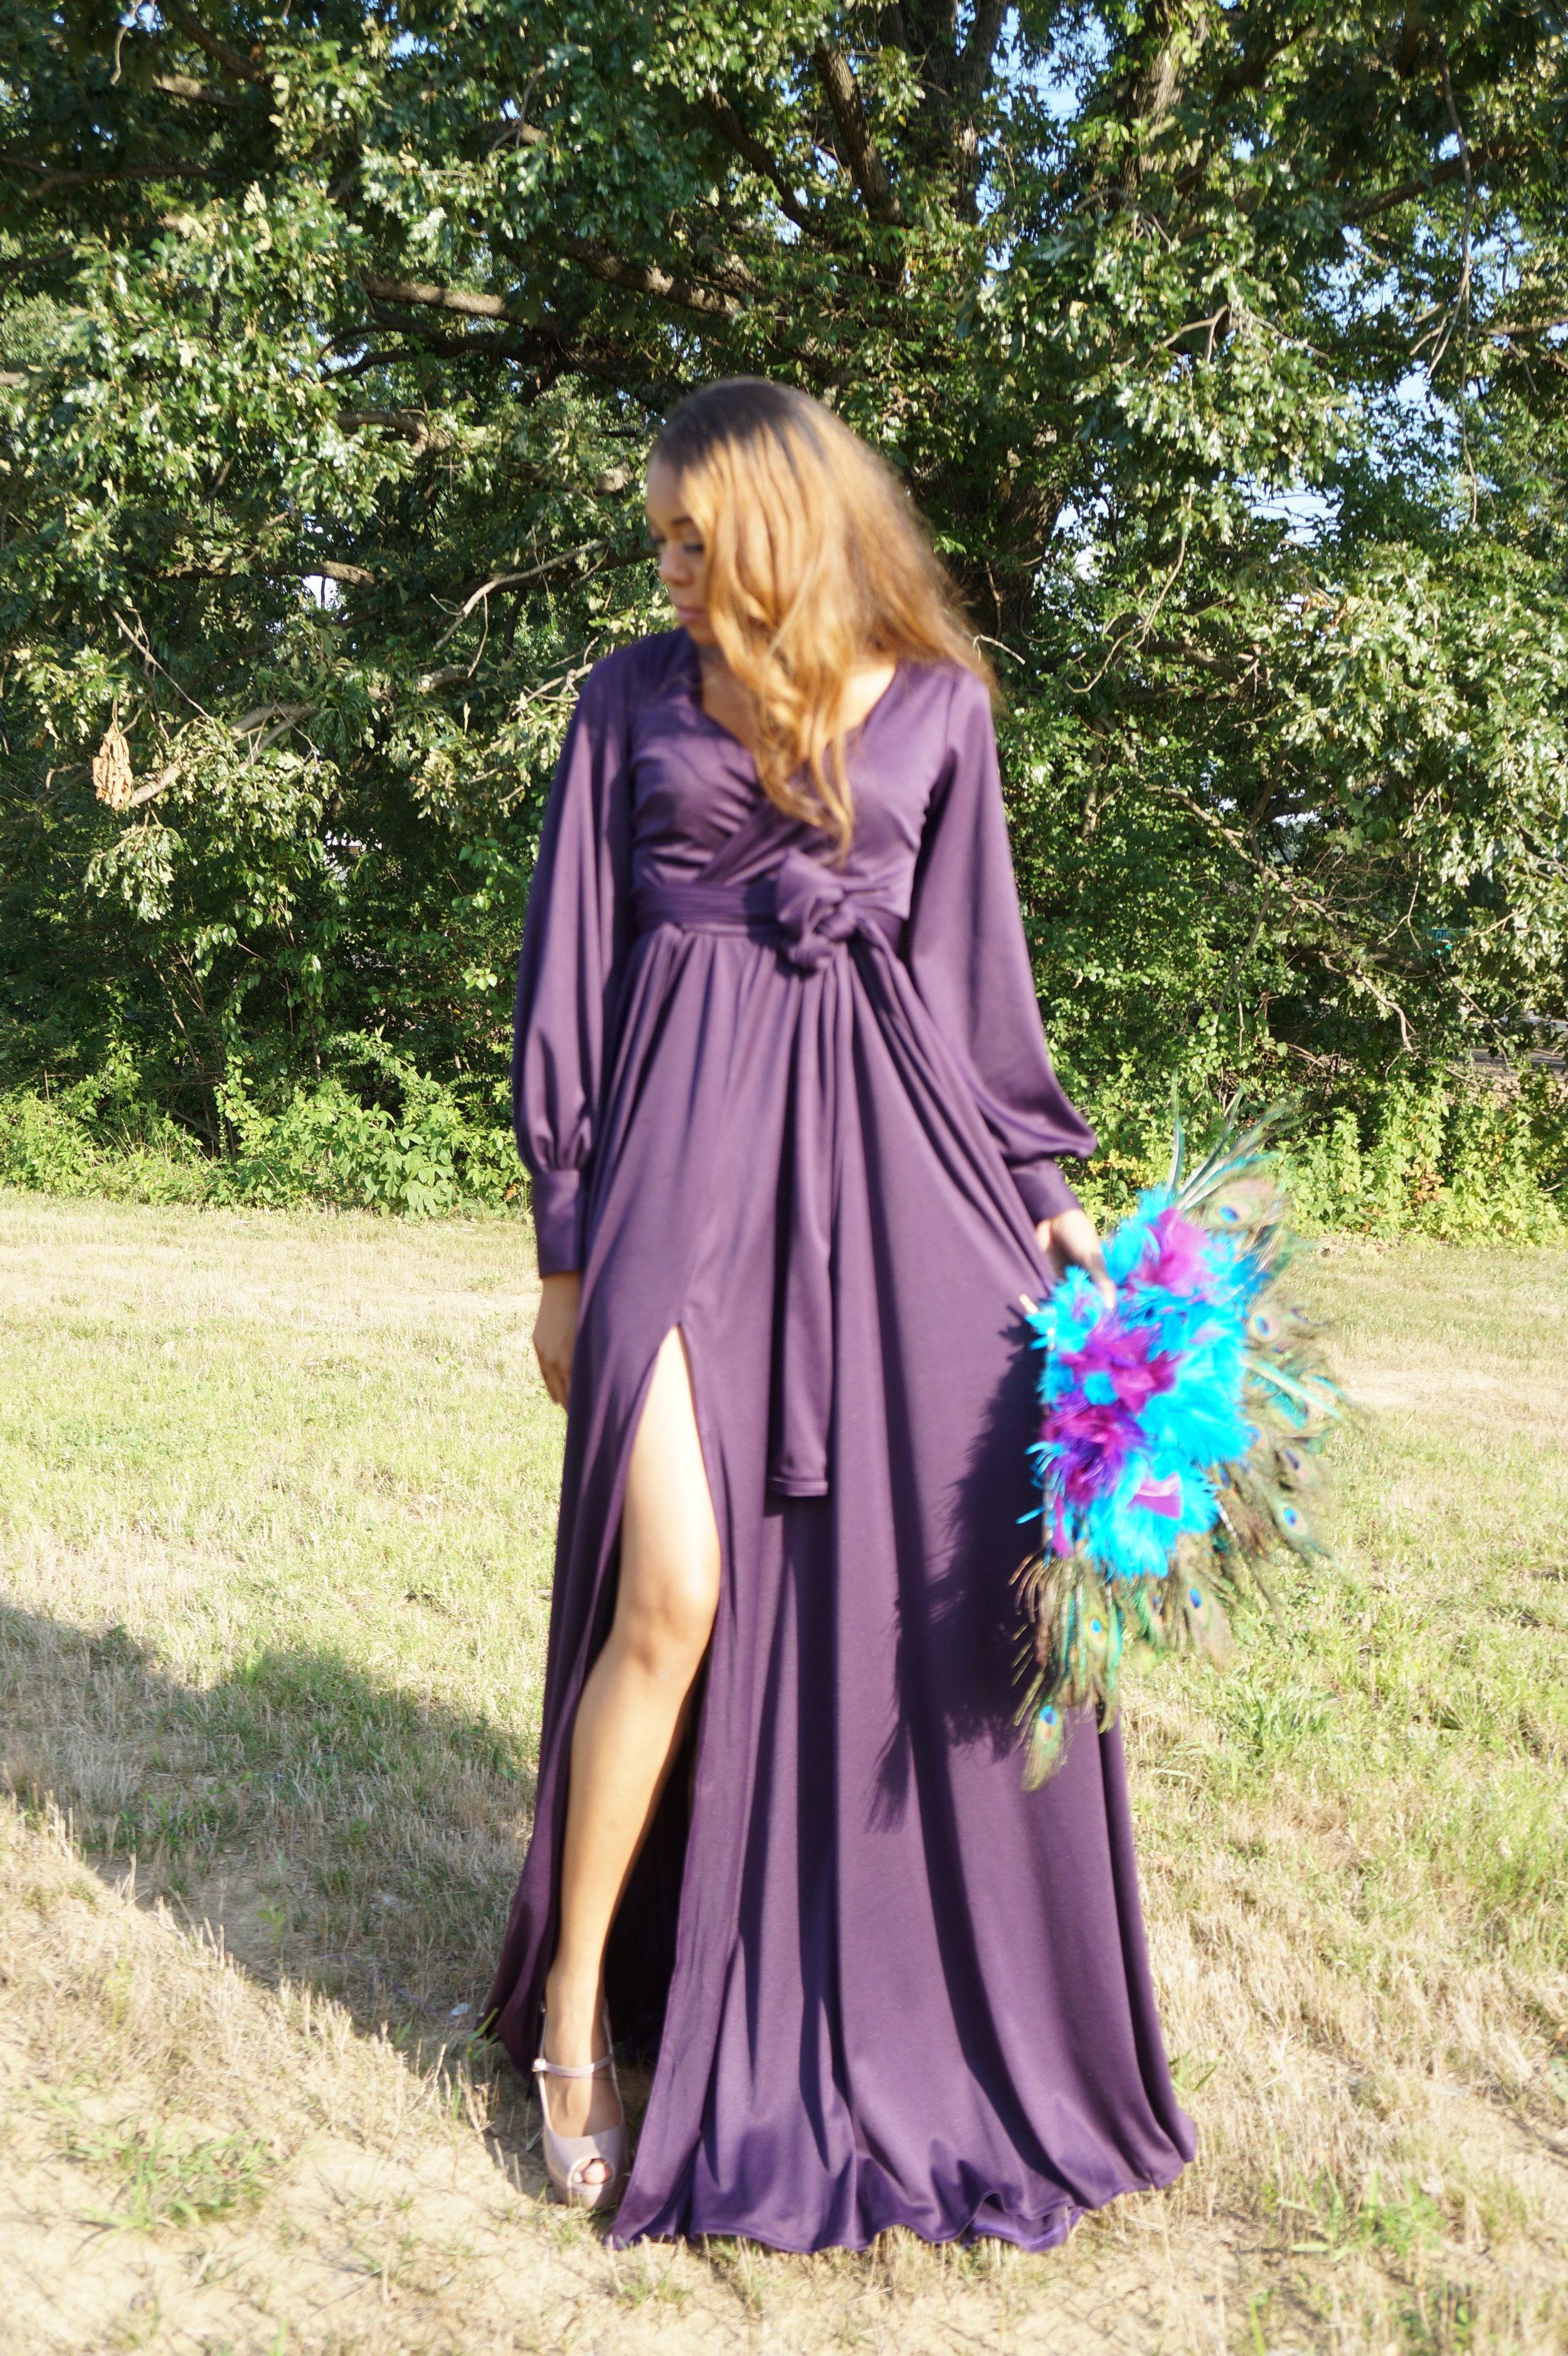 Andrea Fenise Memphis Fashion Blogger shares her design work